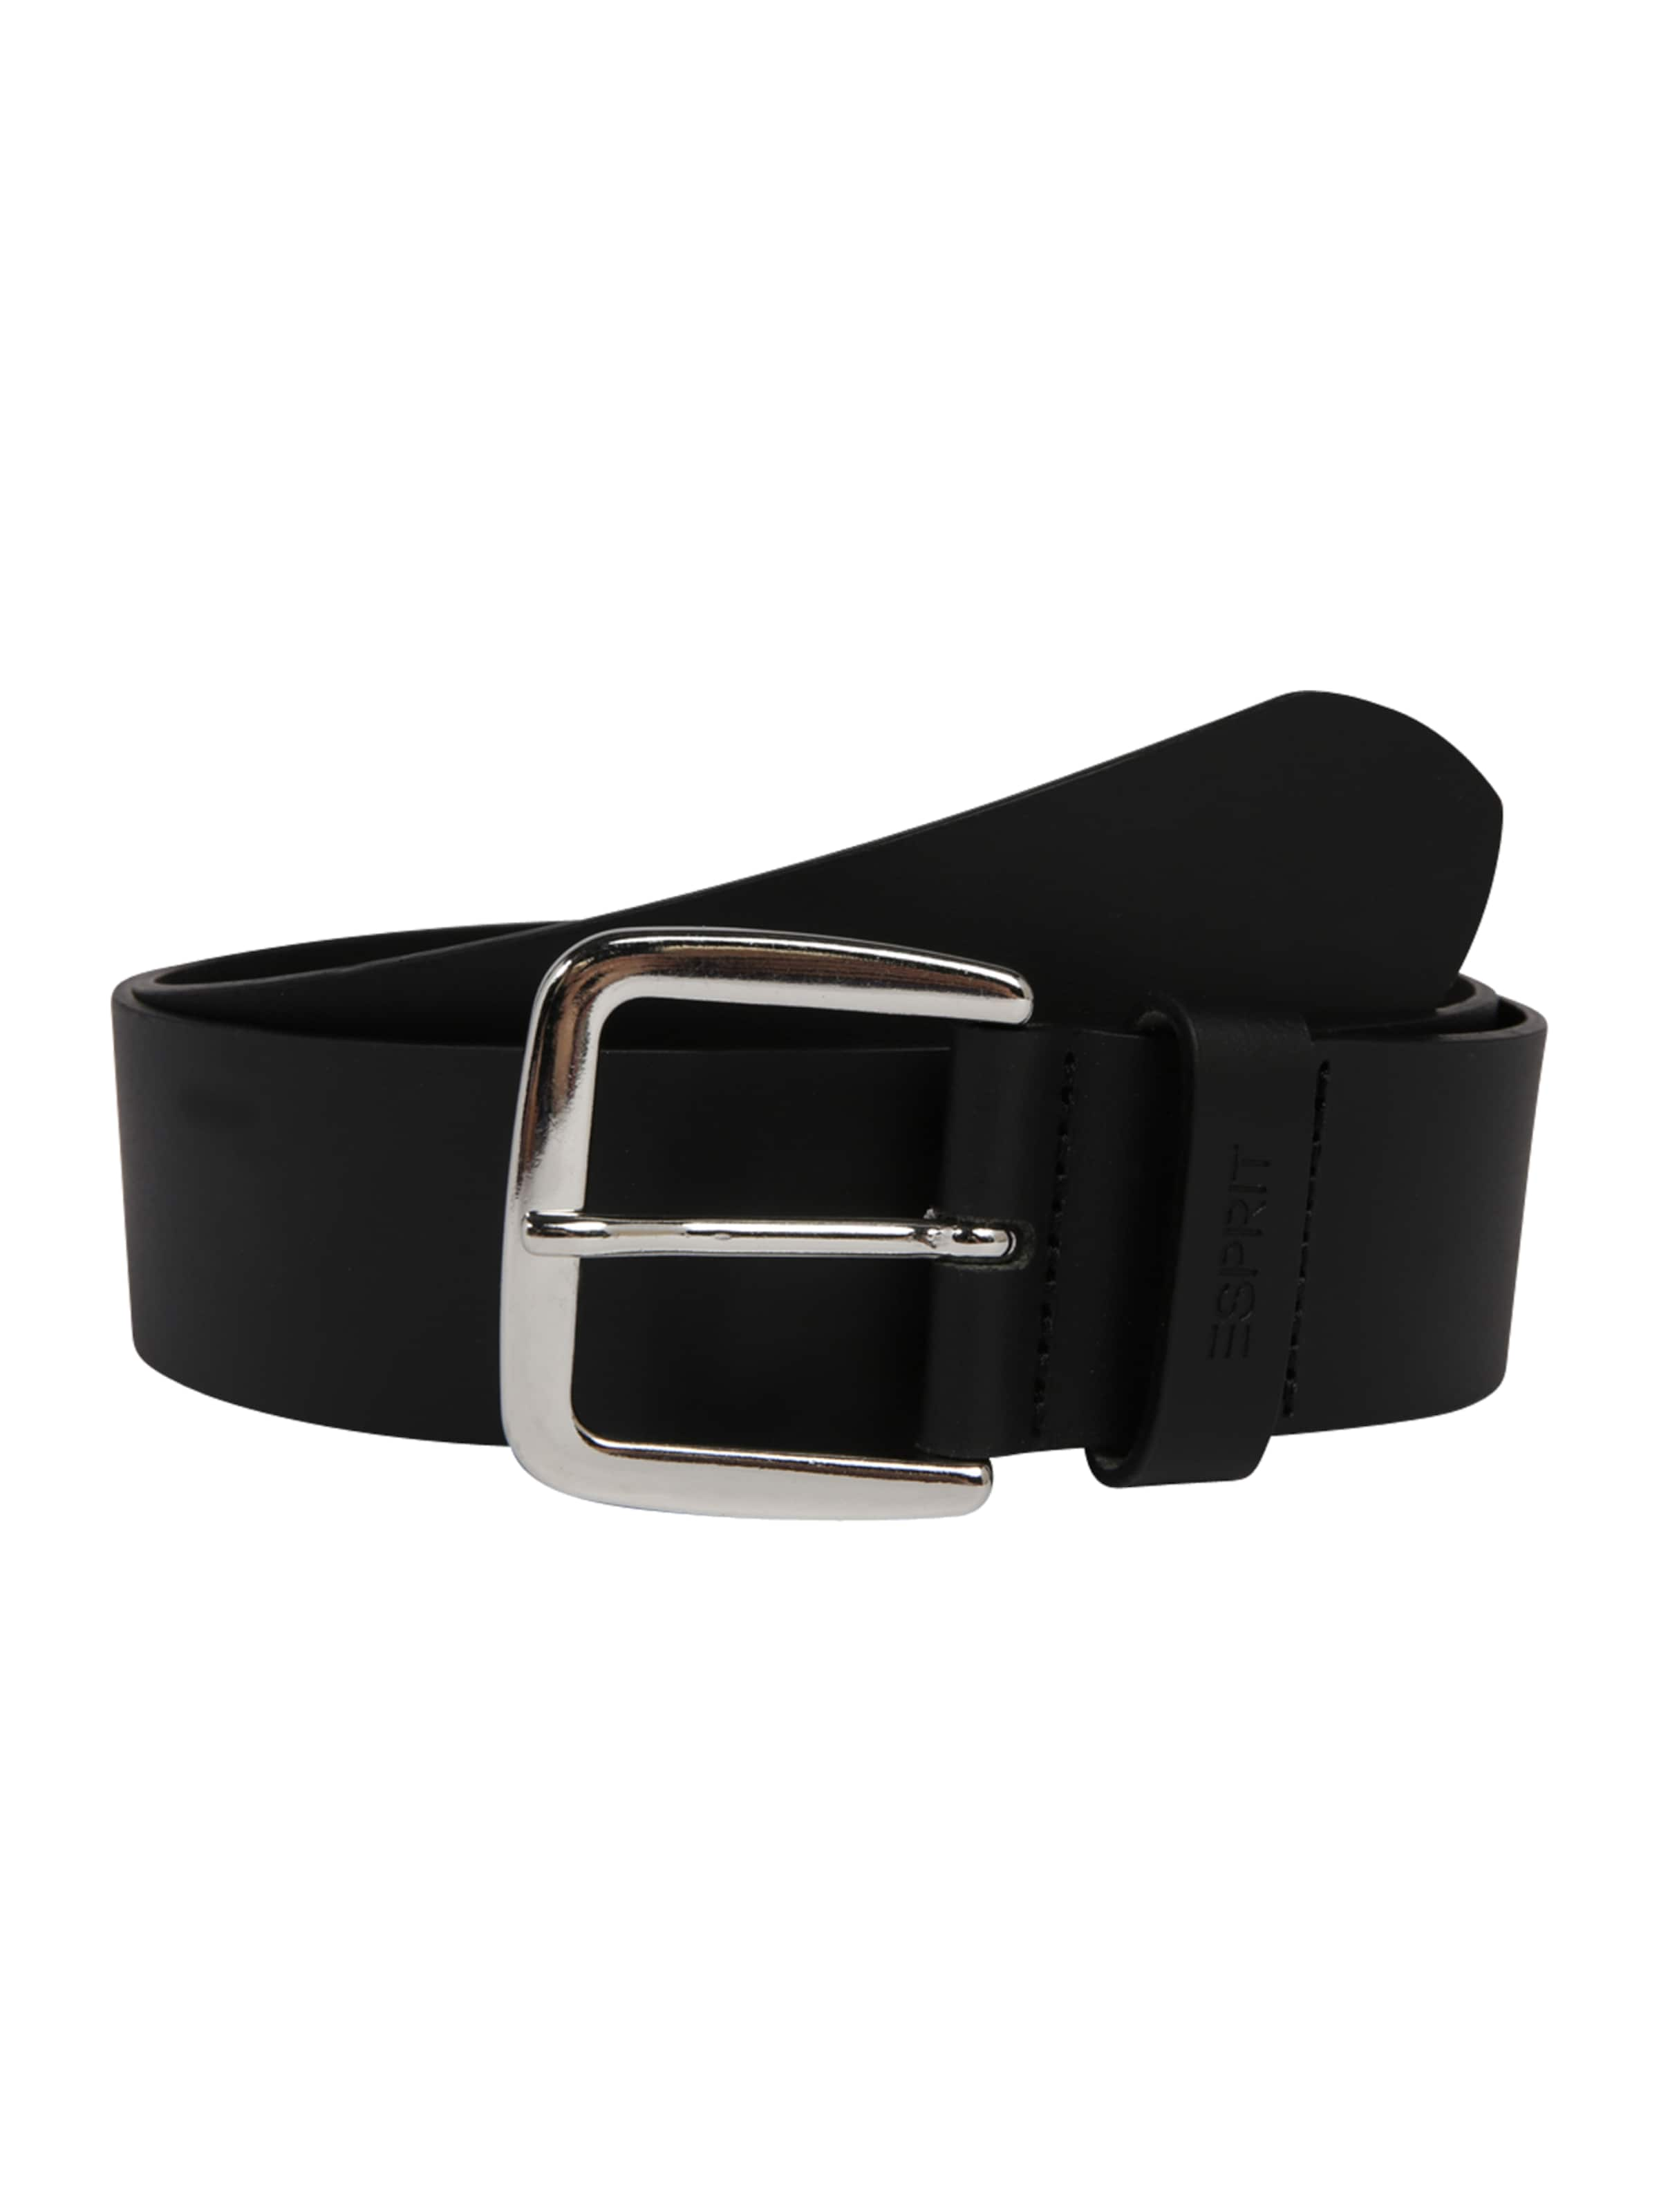 Noir 'new Ceinture Basic Belt' En Esprit UMVpGqSzL